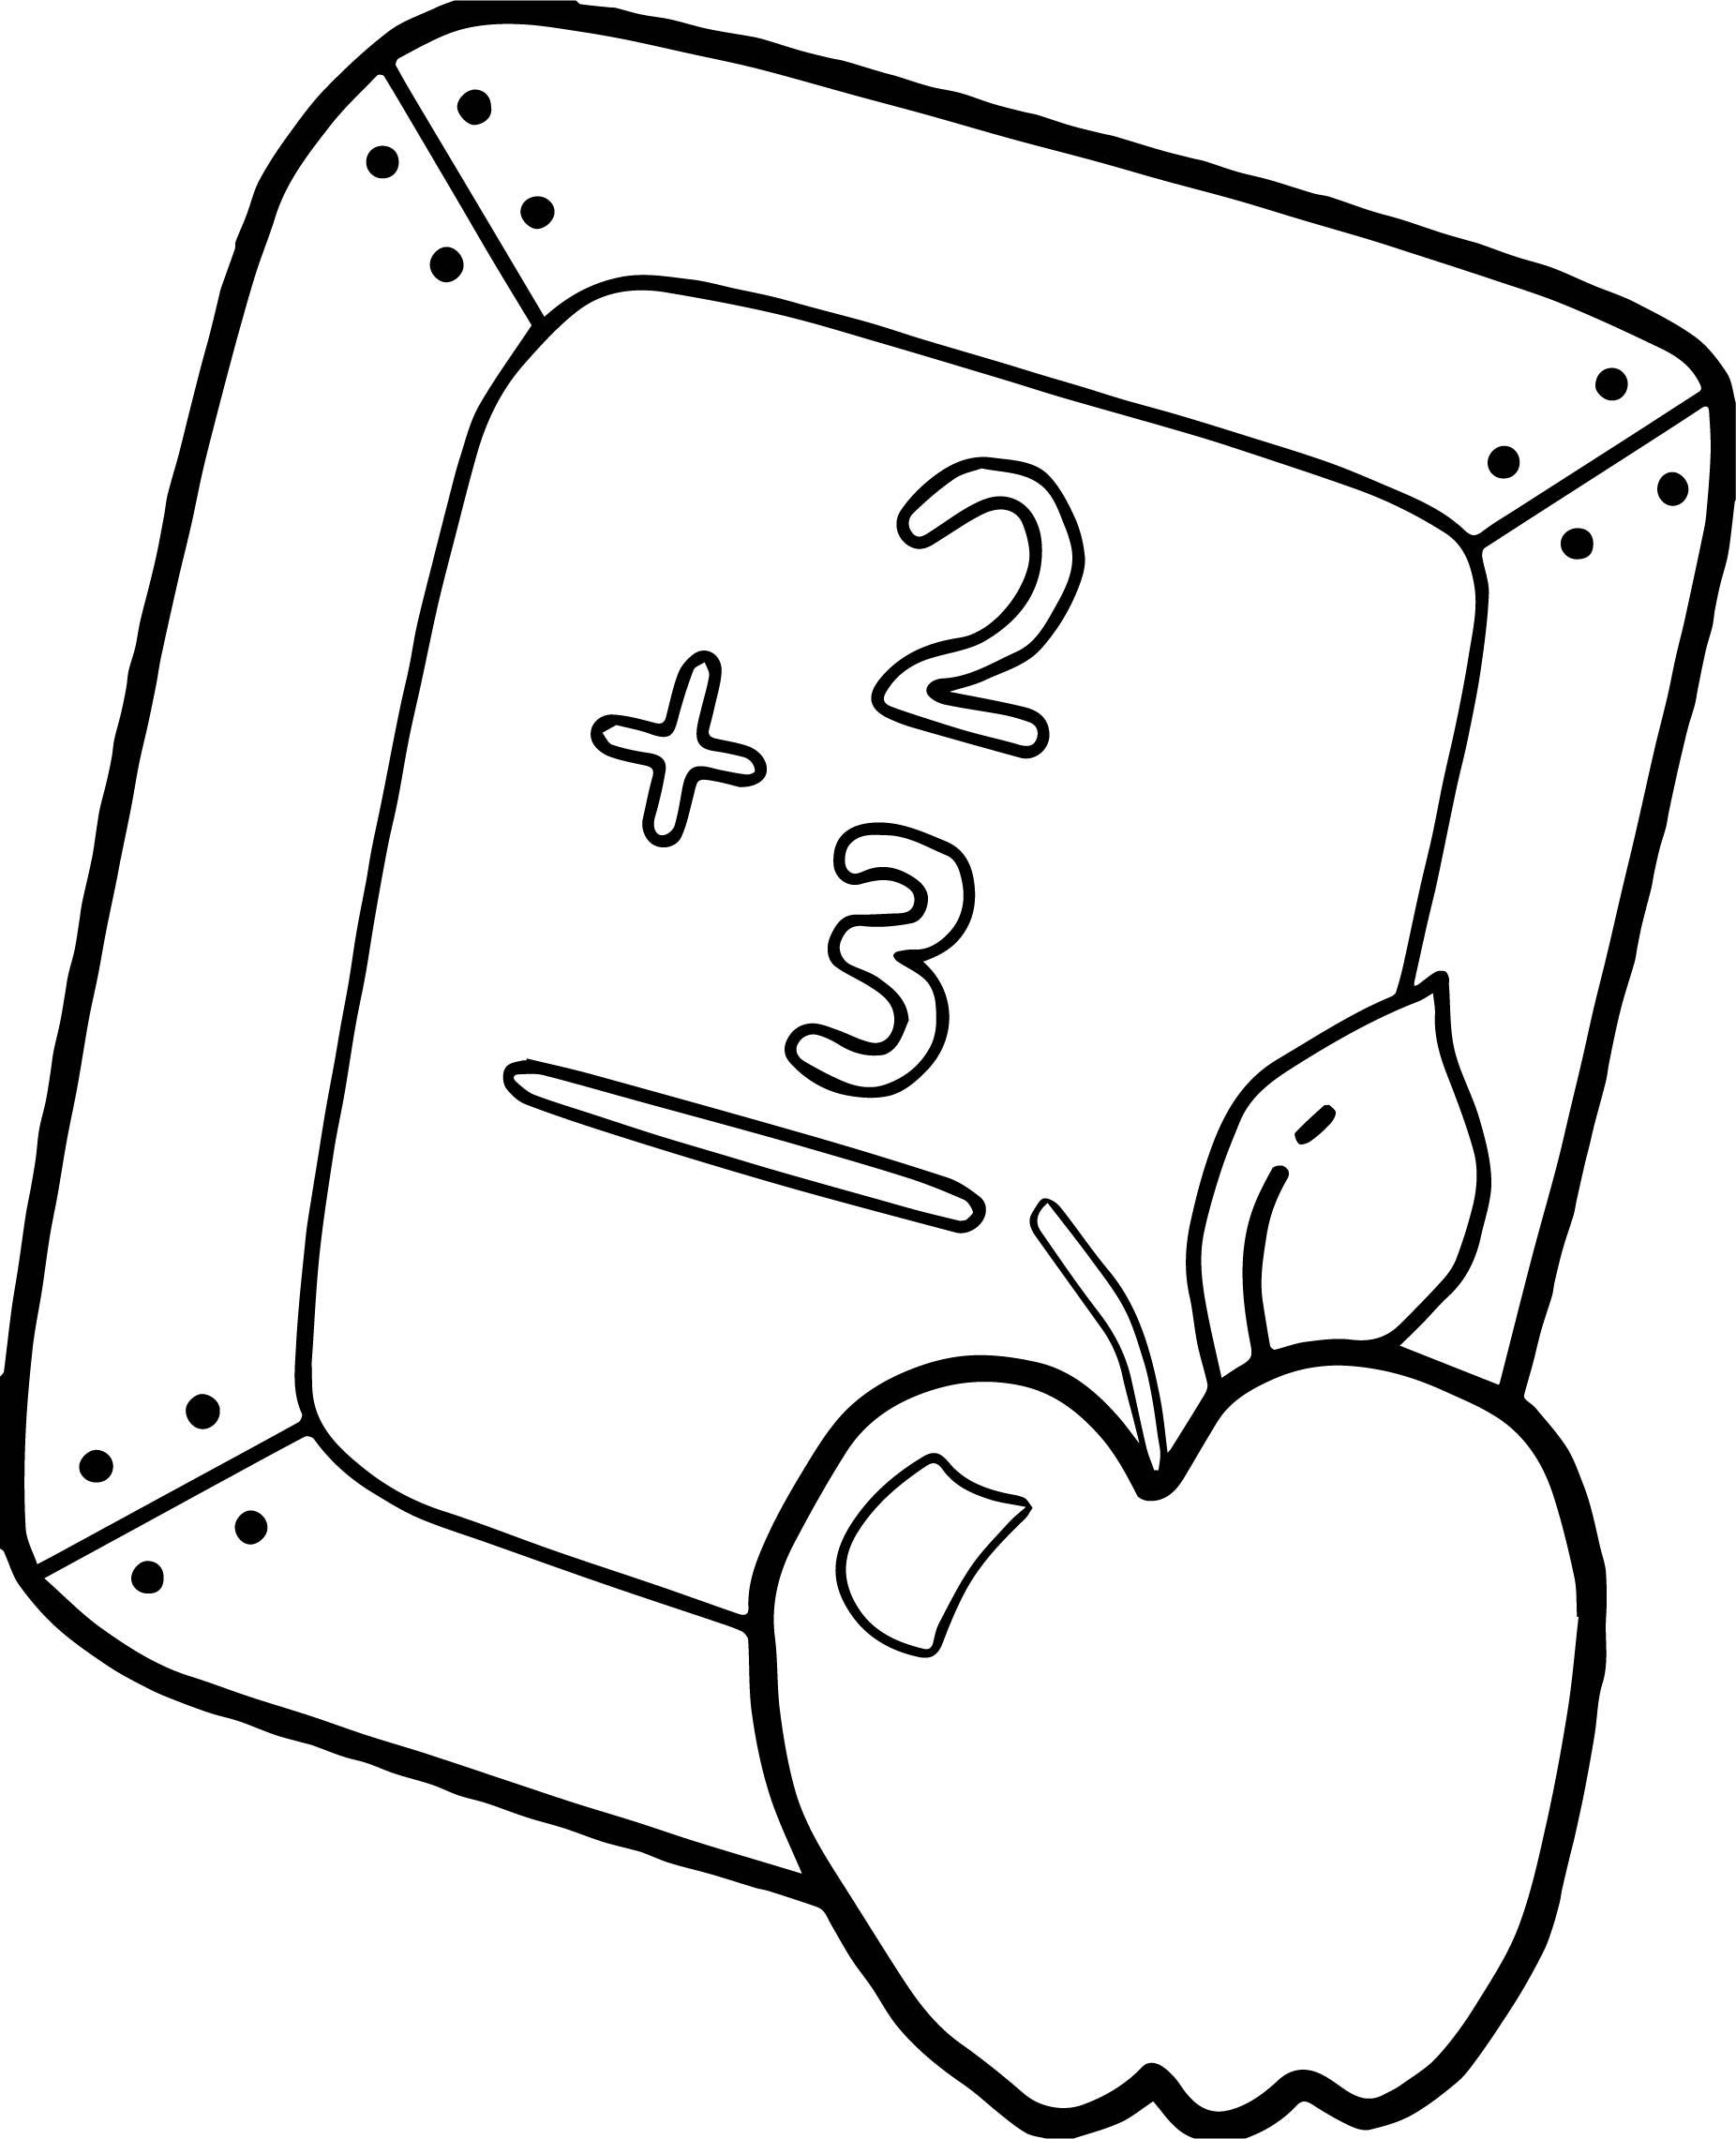 School Apple Slateapple Coloring Page